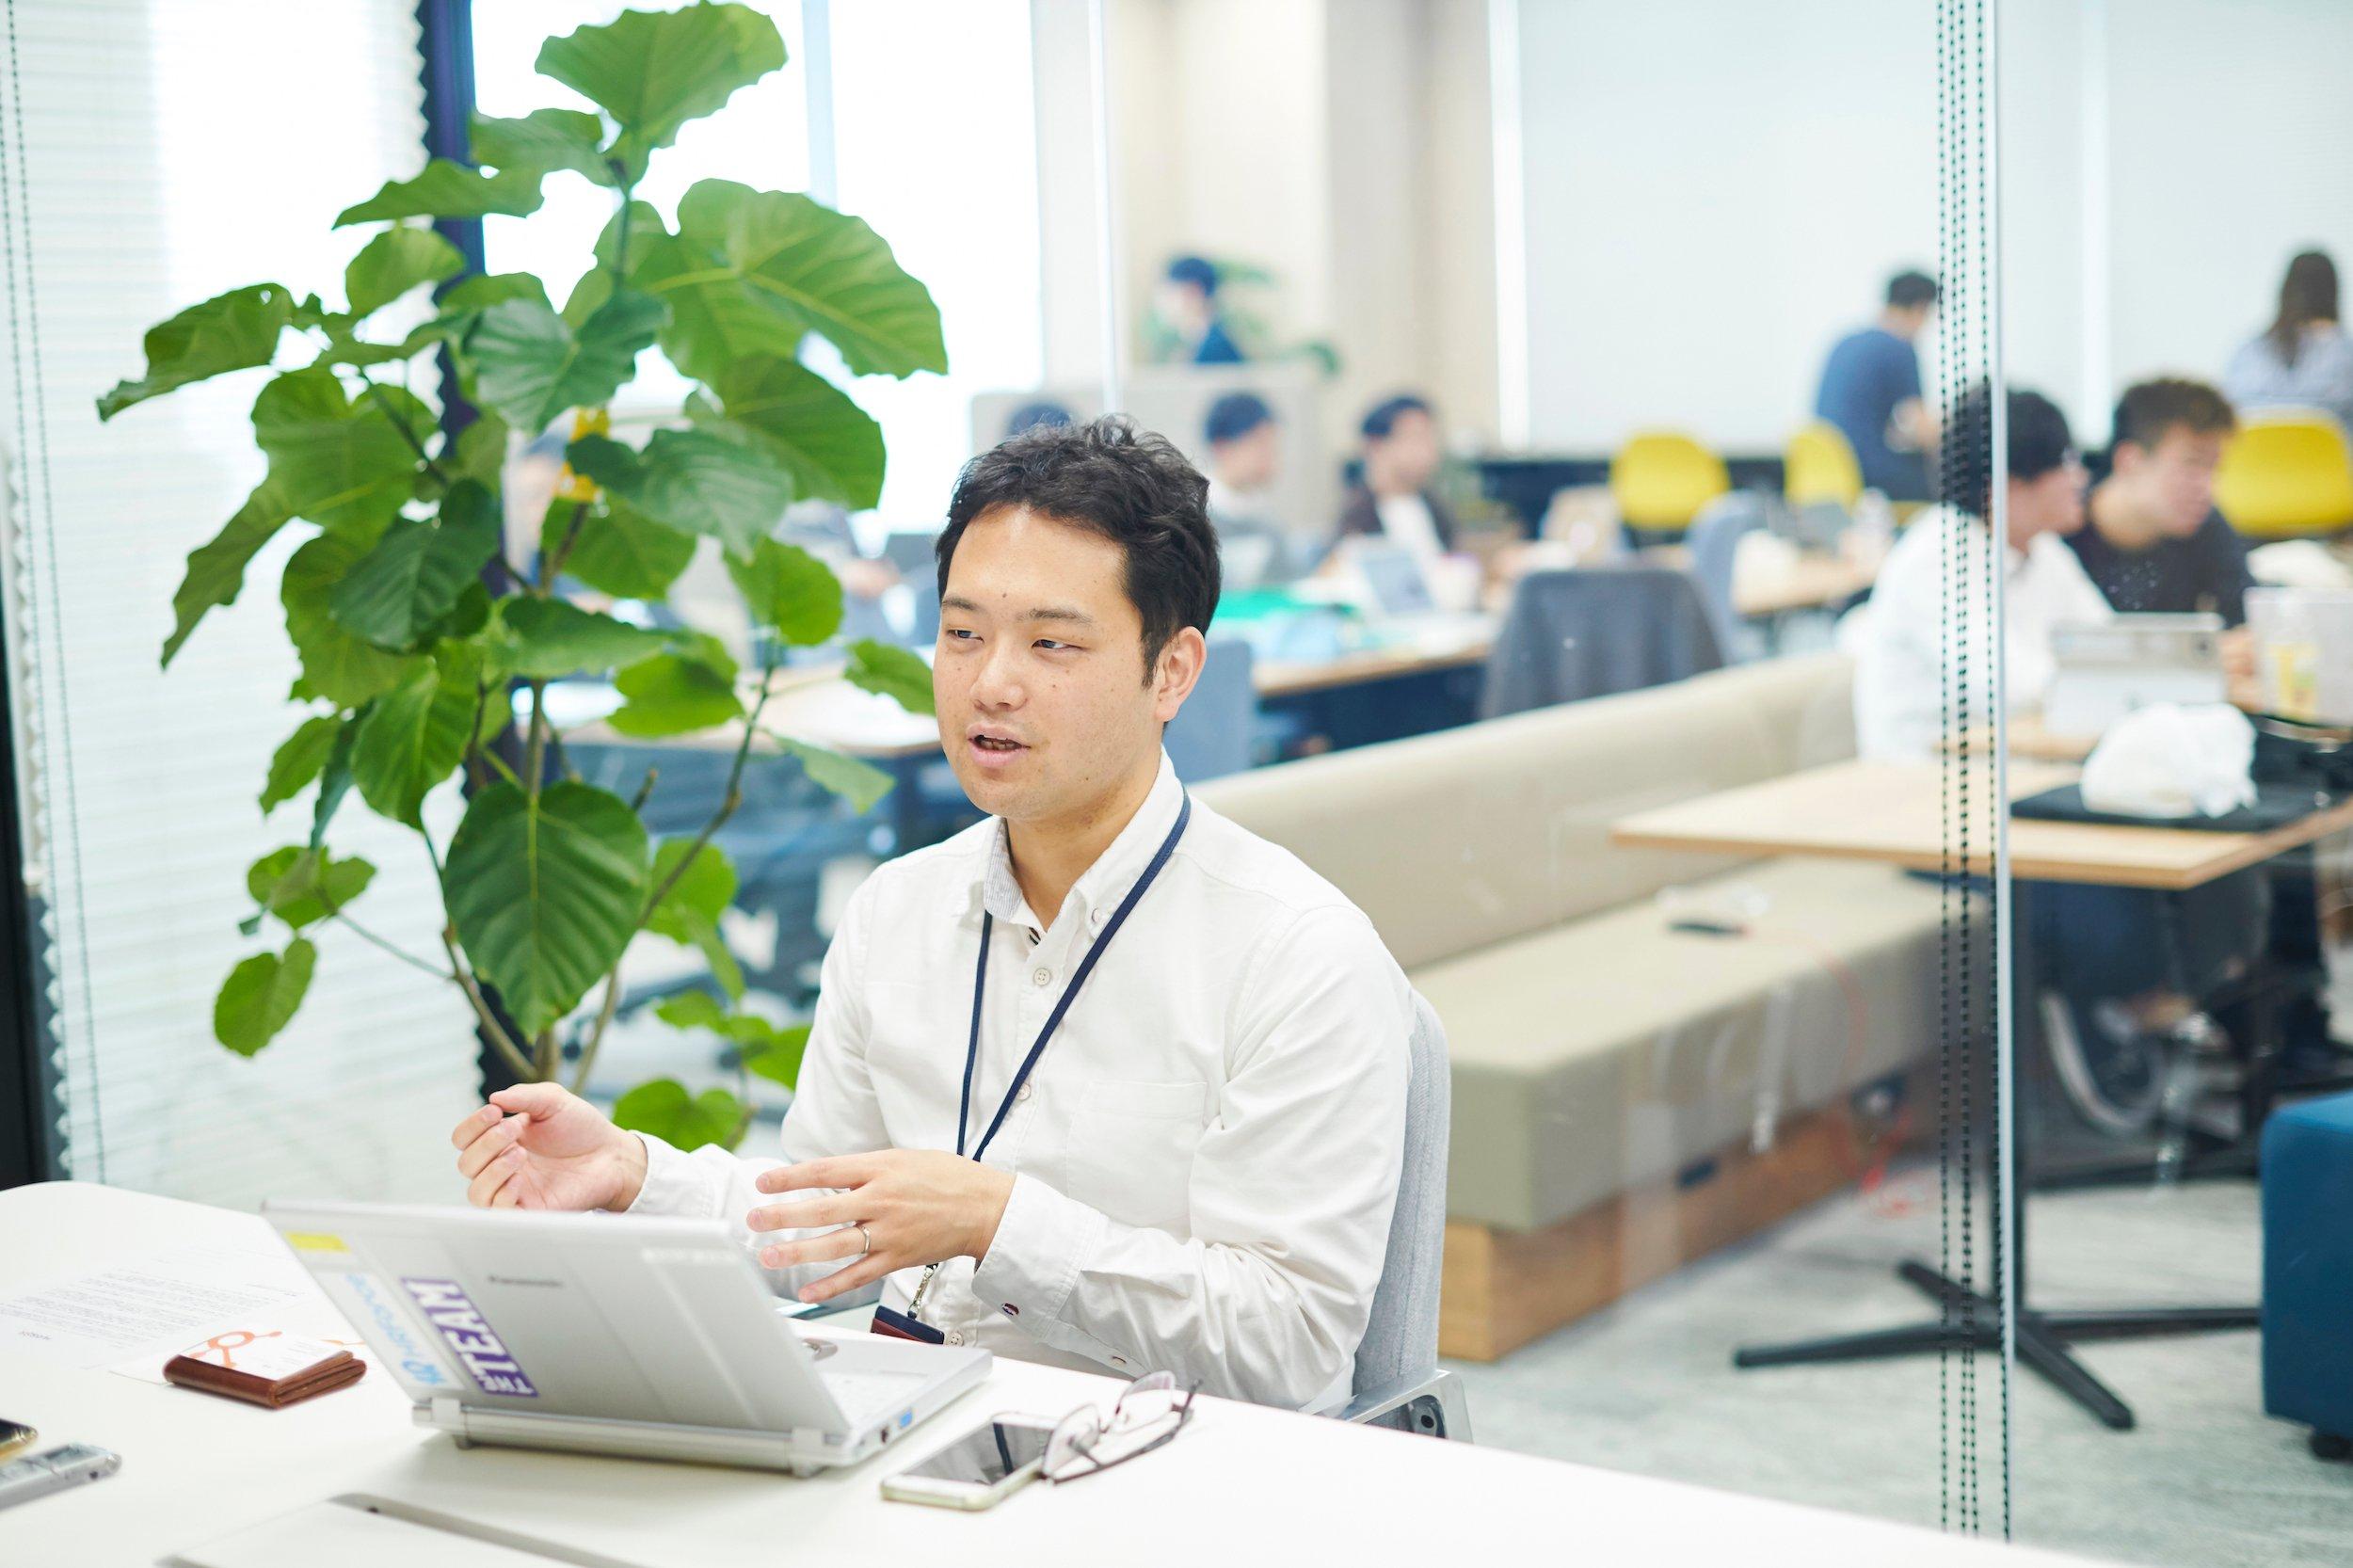 【HubSpot導入事例】船井総研の社内起業からスタート。「マーケティング・セールス・カスタマーサービス」のバリューチェーン強化に取り組む株式会社 HR Force